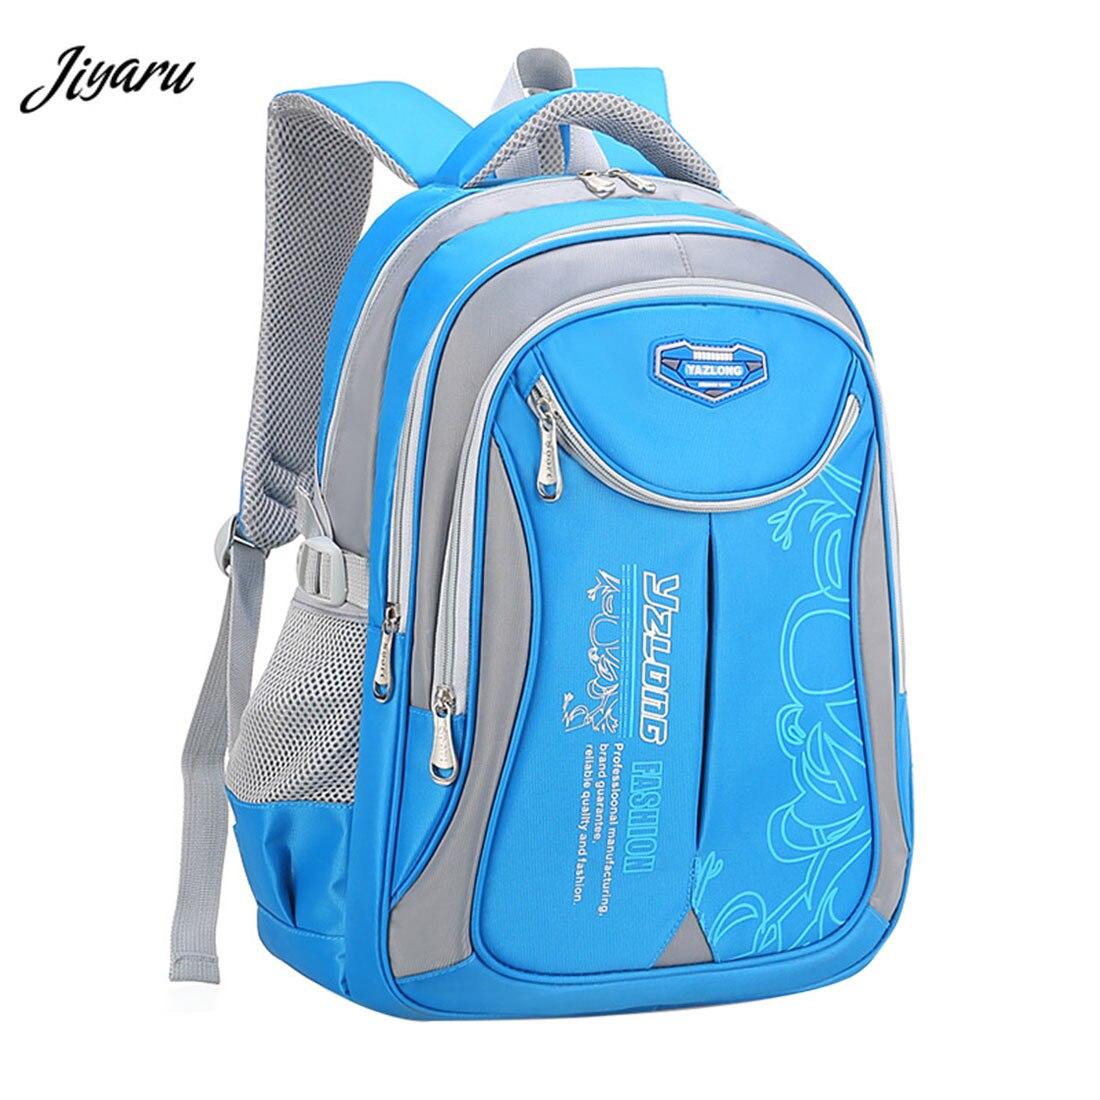 Hot Sale Backpack Schoolbags Children School Bags for Teenagers Boys Girls Big Capacity Waterproof Satchel Kids Book Bag Mochila